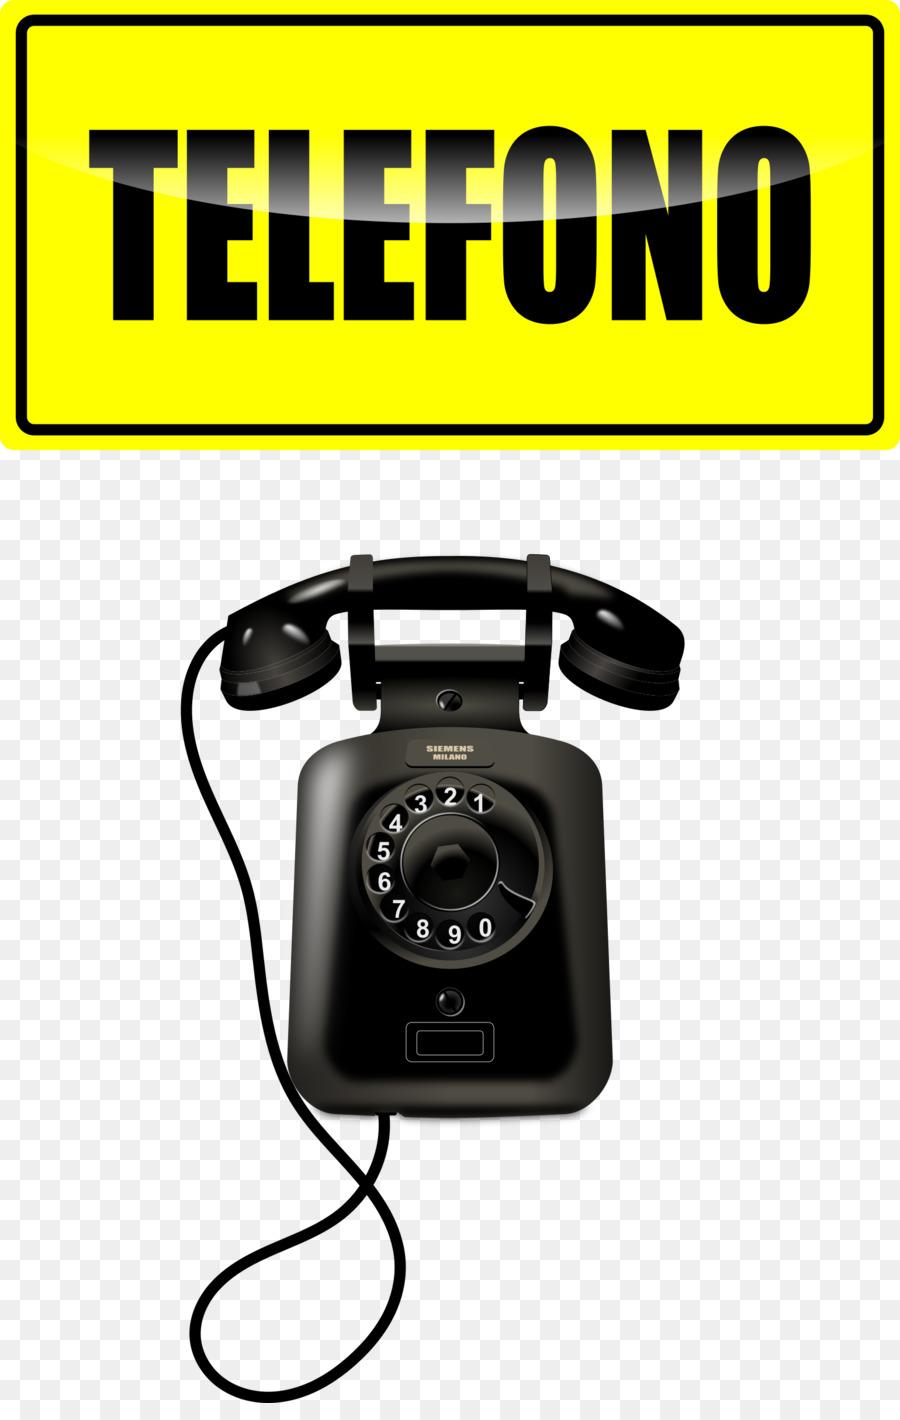 Cartoon technology . Telephone clipart telephony